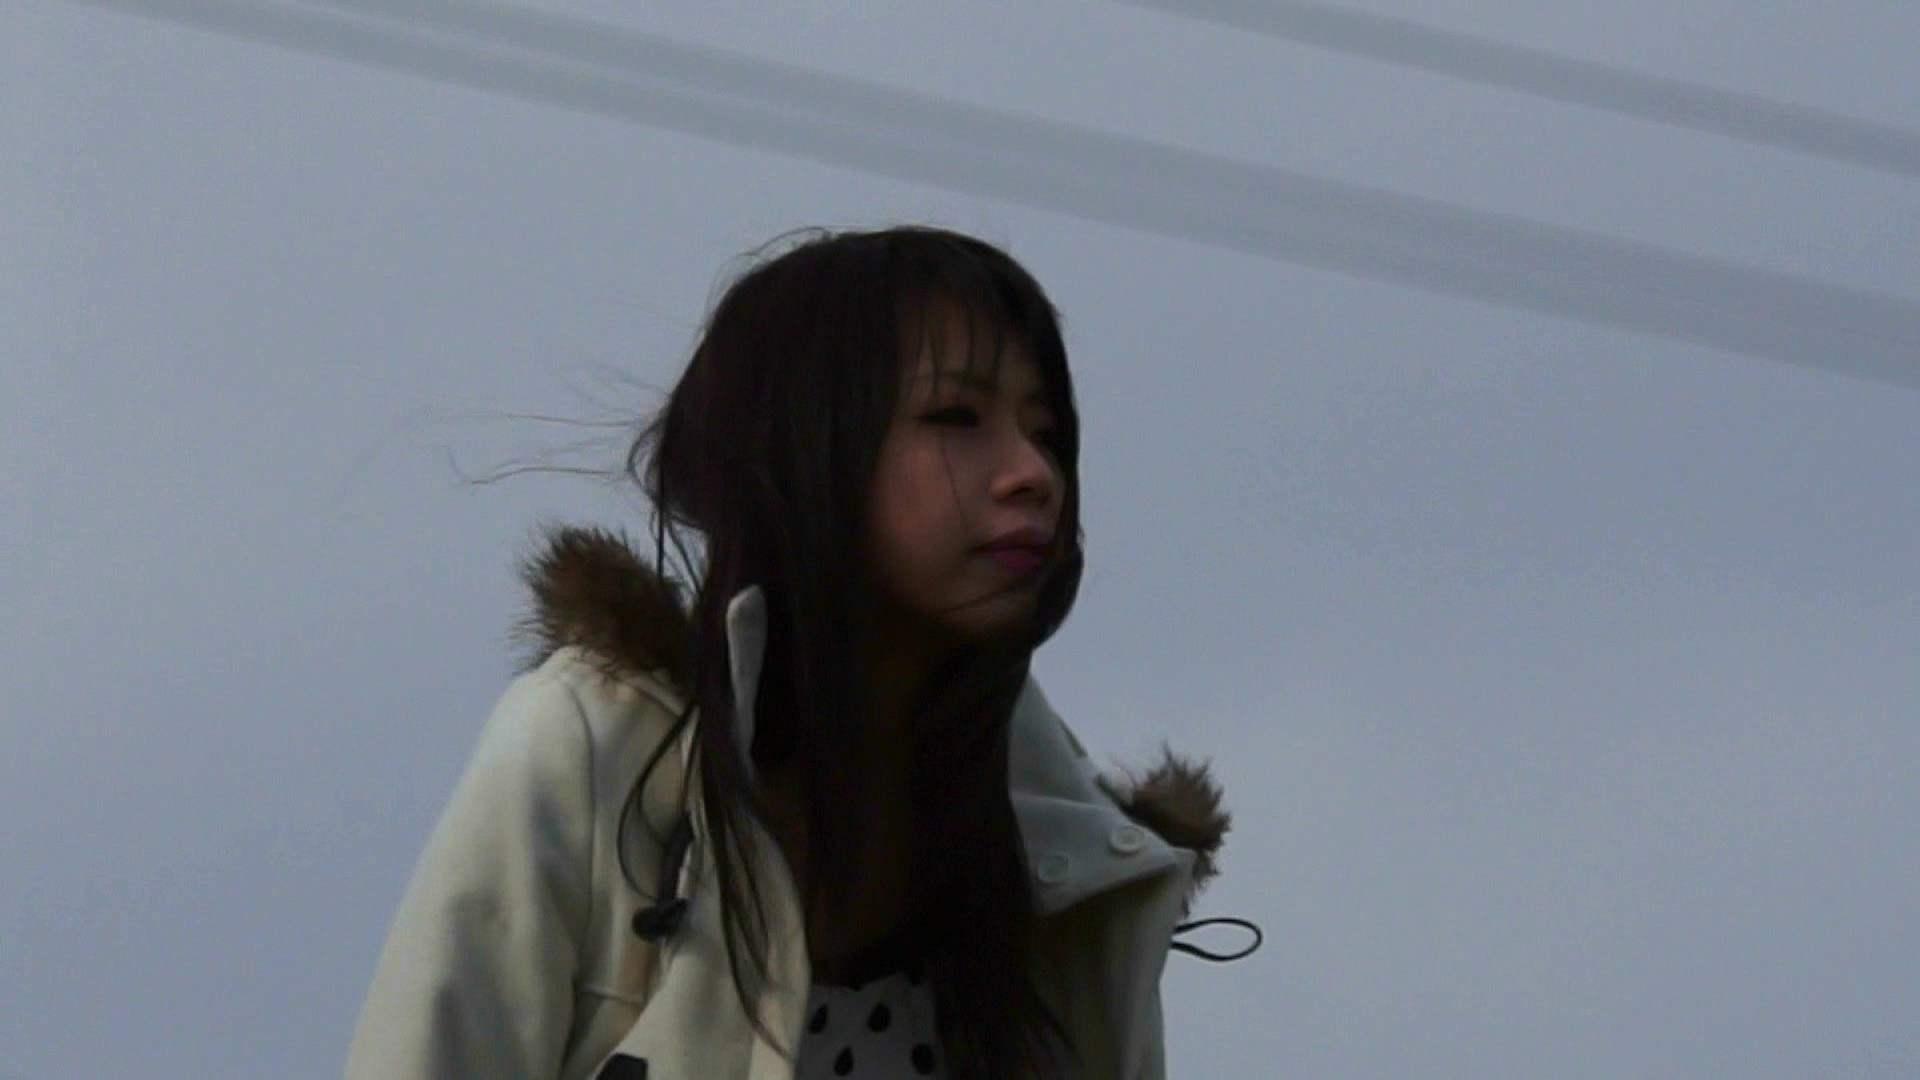 vol.2 自宅近く思い出の地で黄昏る志穂さん OLのボディ  83PIX 56